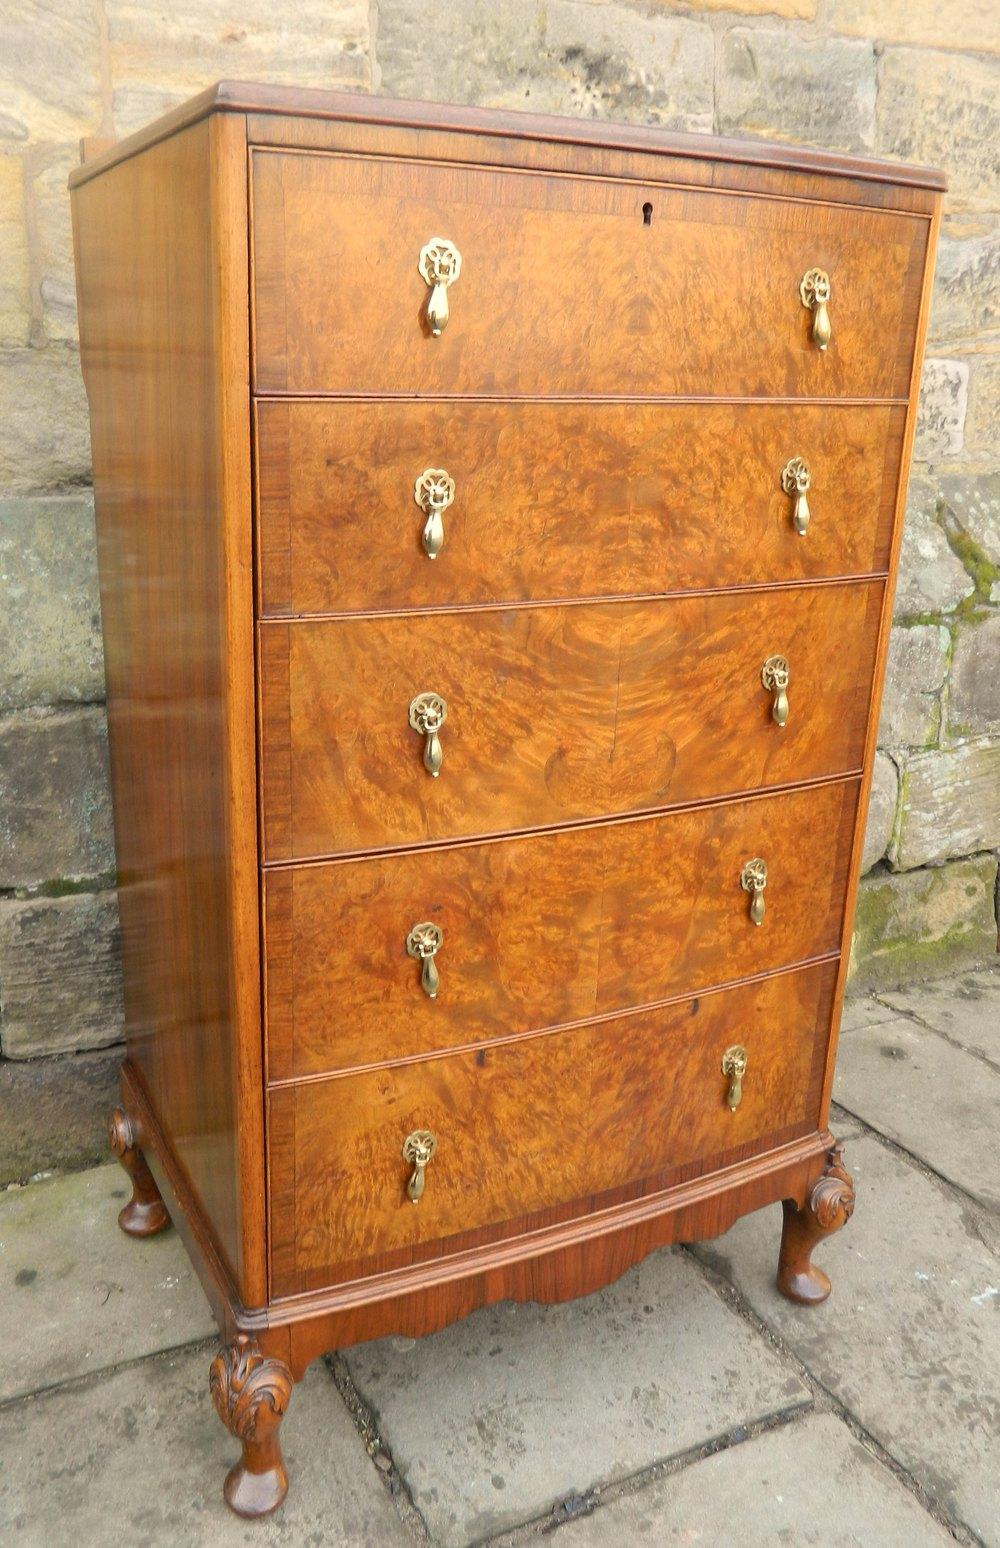 walnut tallboy chest of drawers antiques atlas. Black Bedroom Furniture Sets. Home Design Ideas